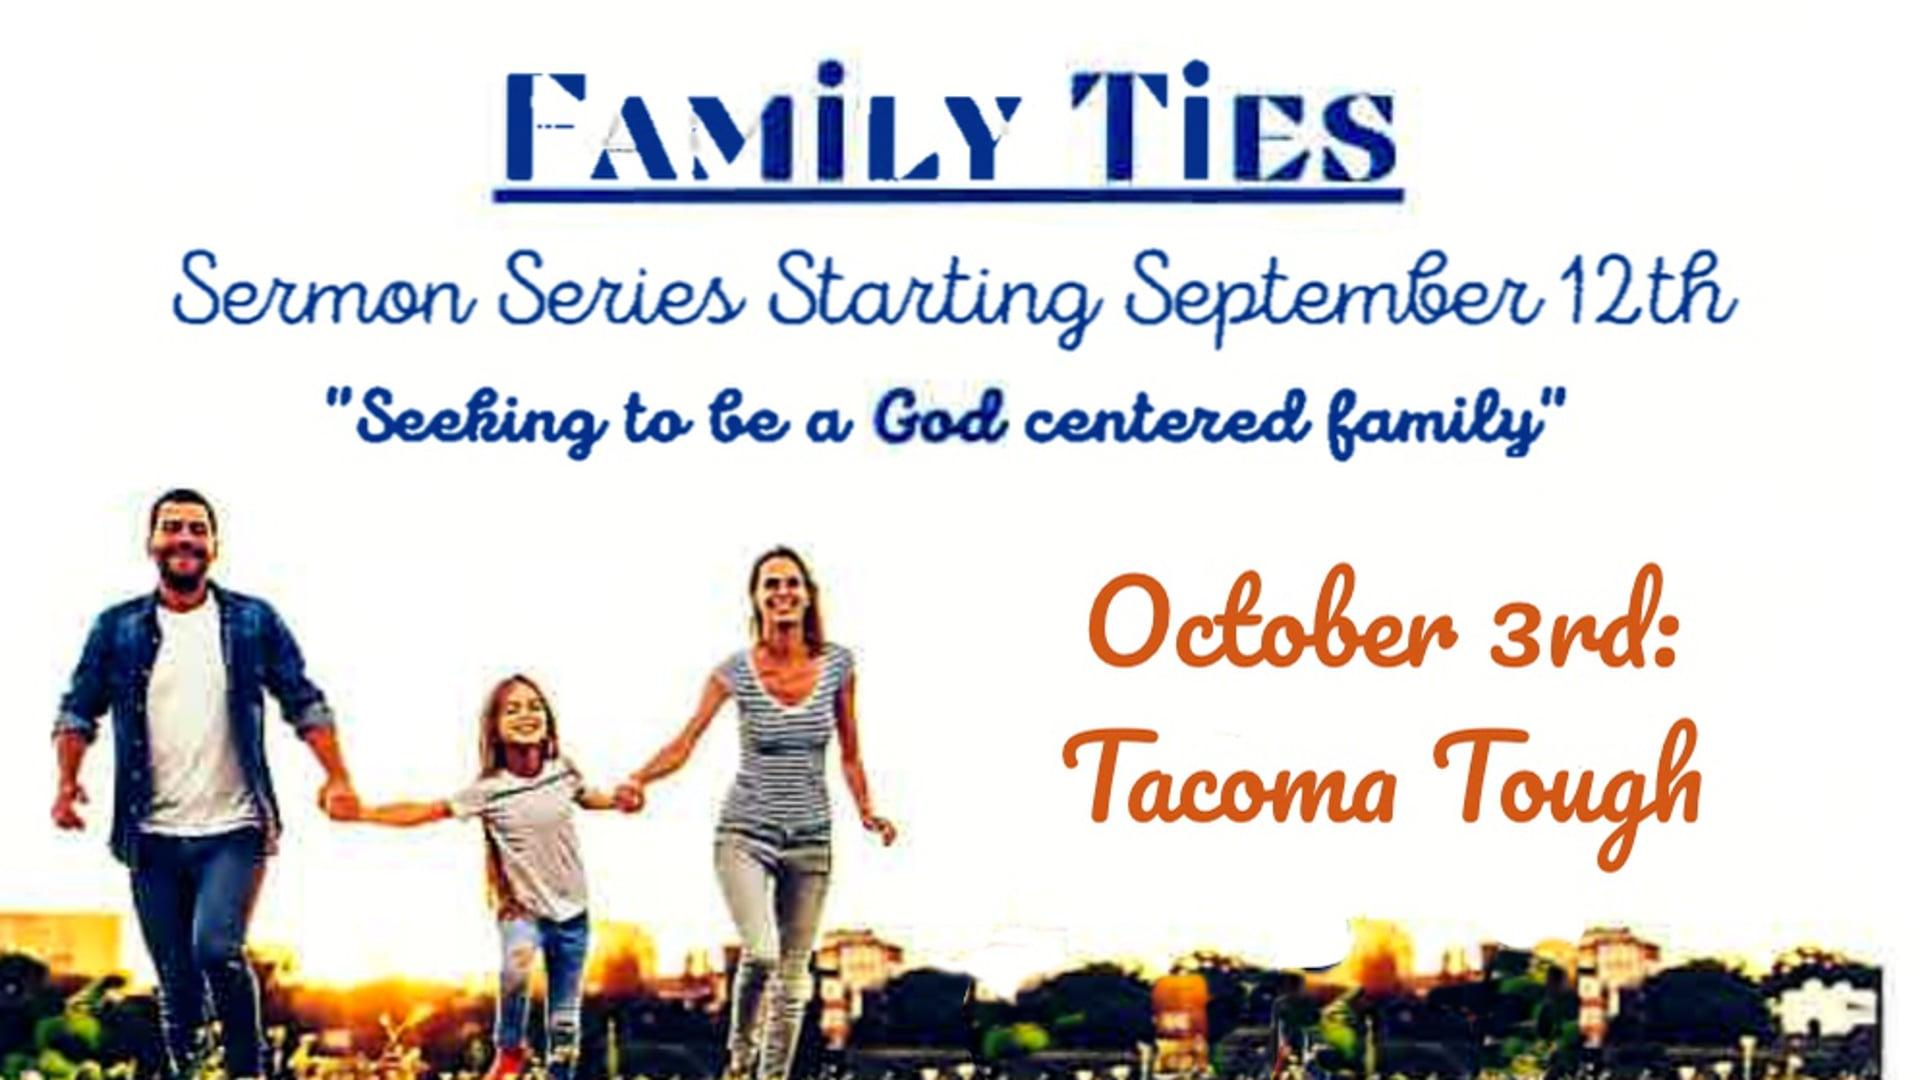 Royston Baptist Church 11 AM Worship Service Message for Oct. 3, 2021